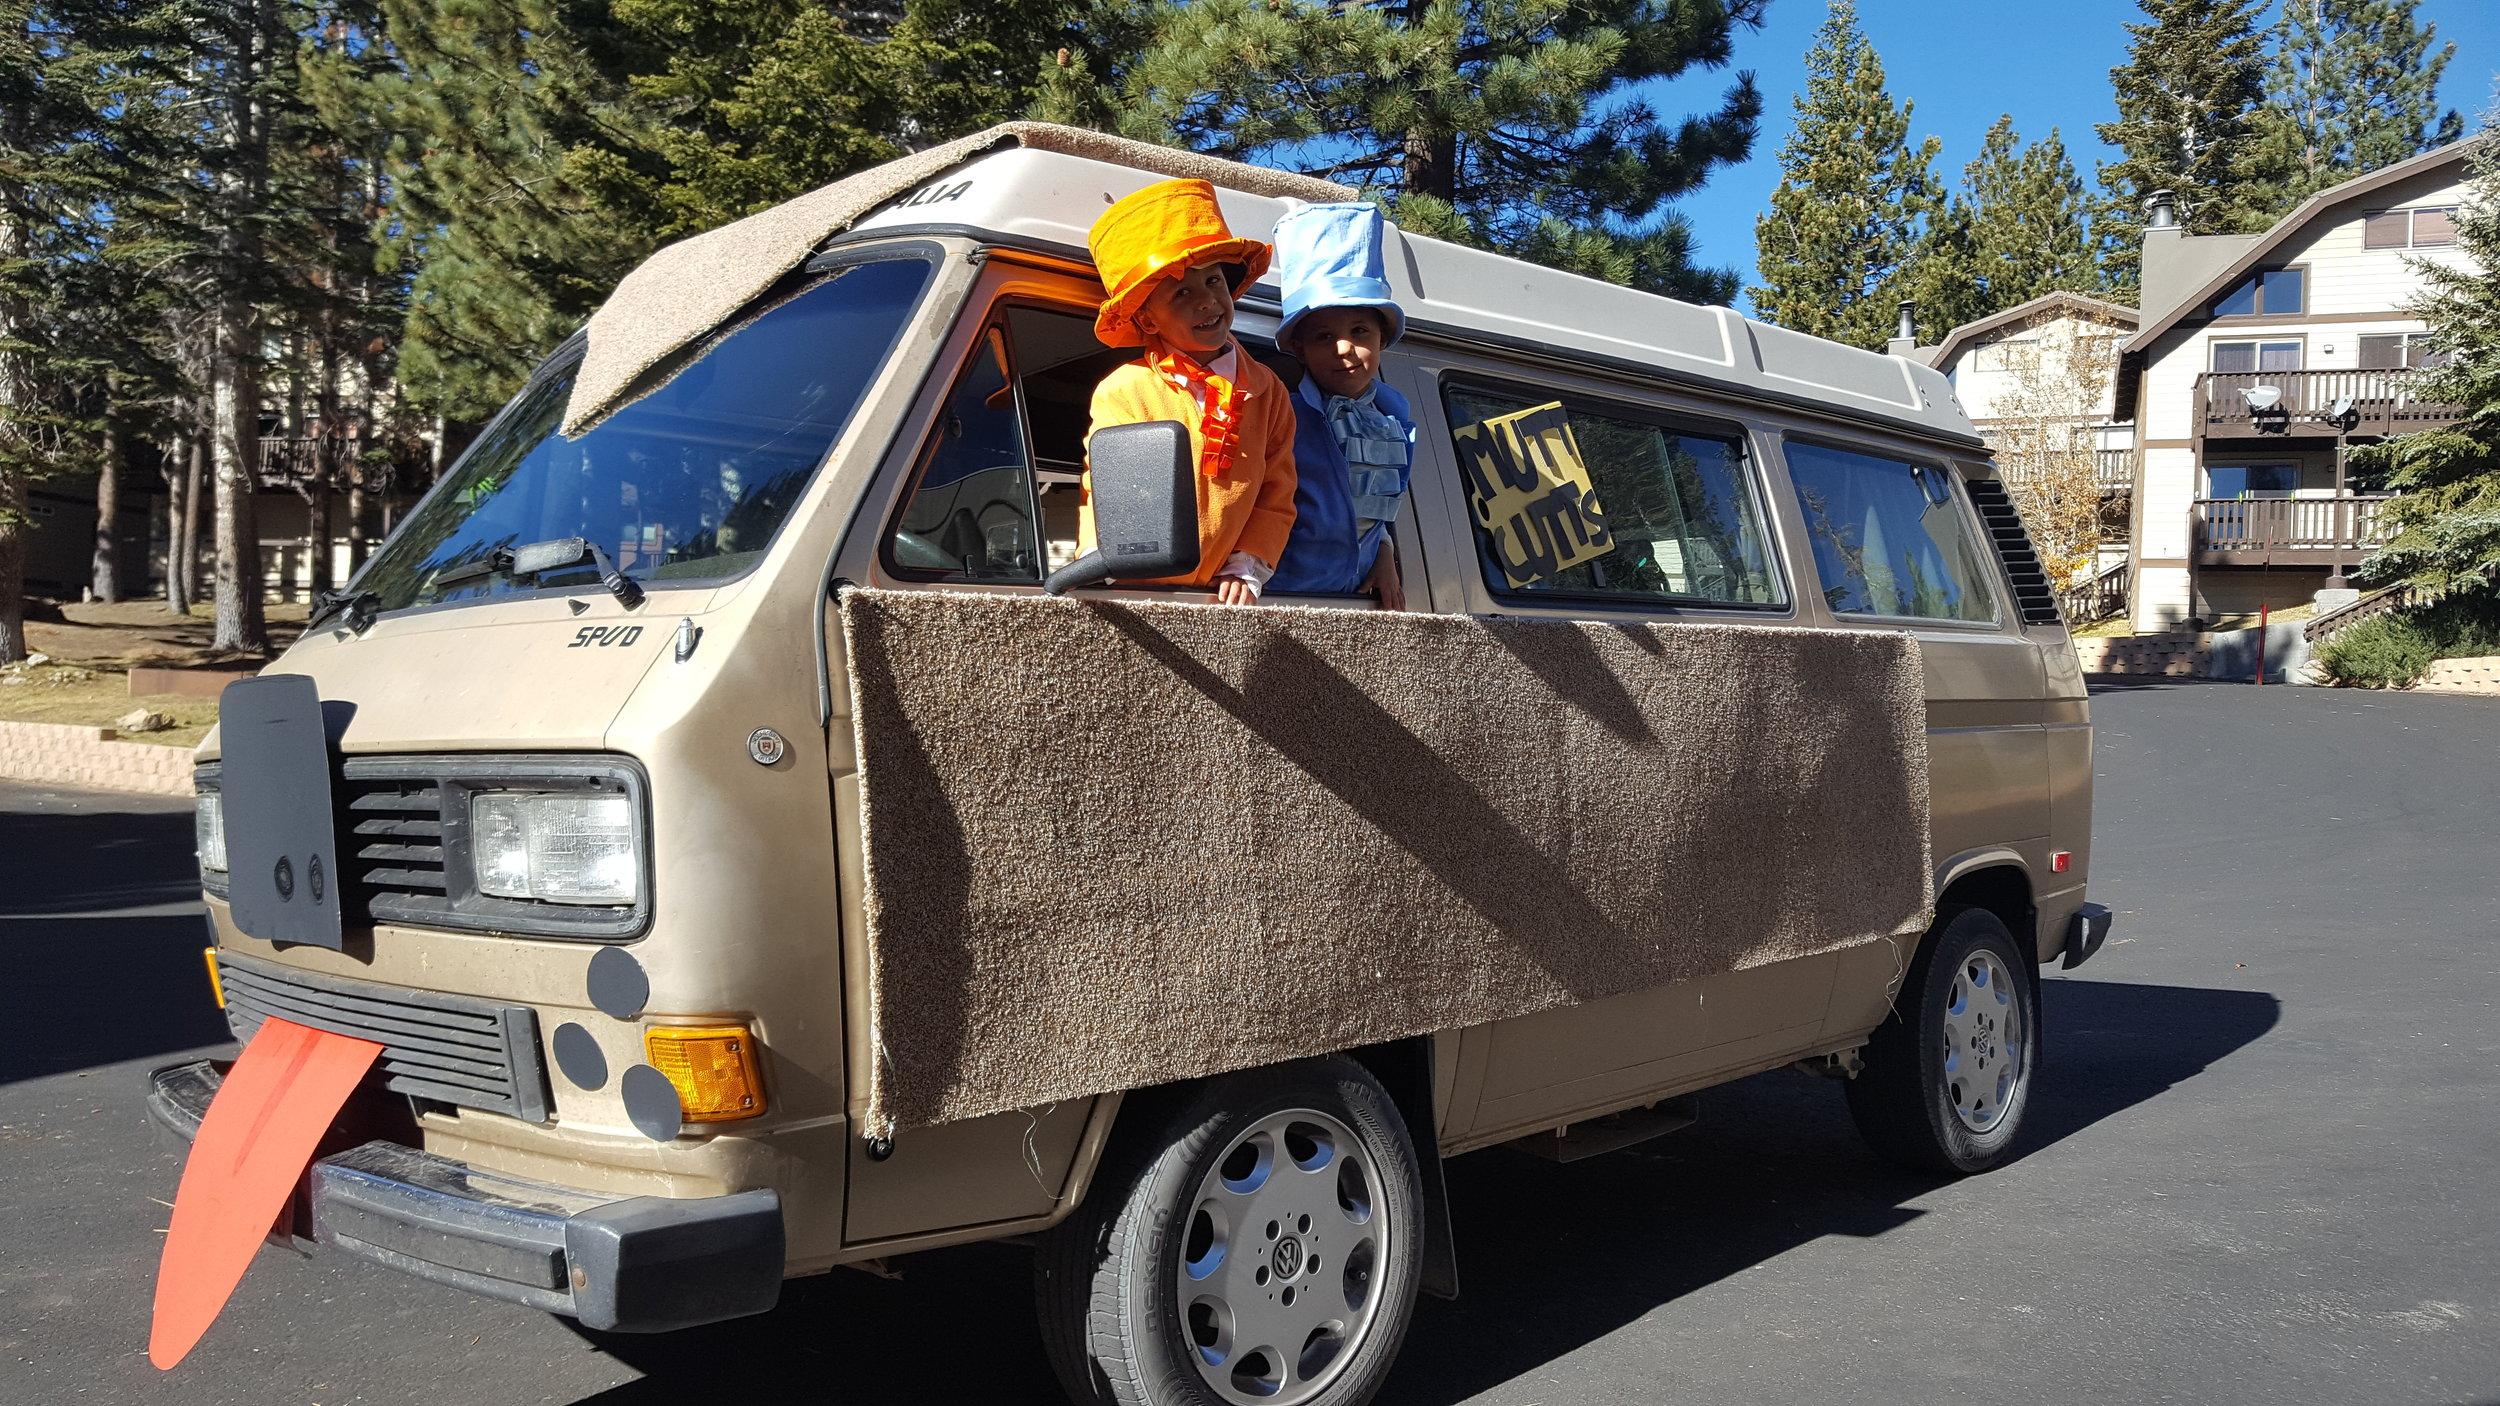 Lloyd & Harry aboard the Shaggin Waggin for Halloween in Mammoth Lakes, Cali